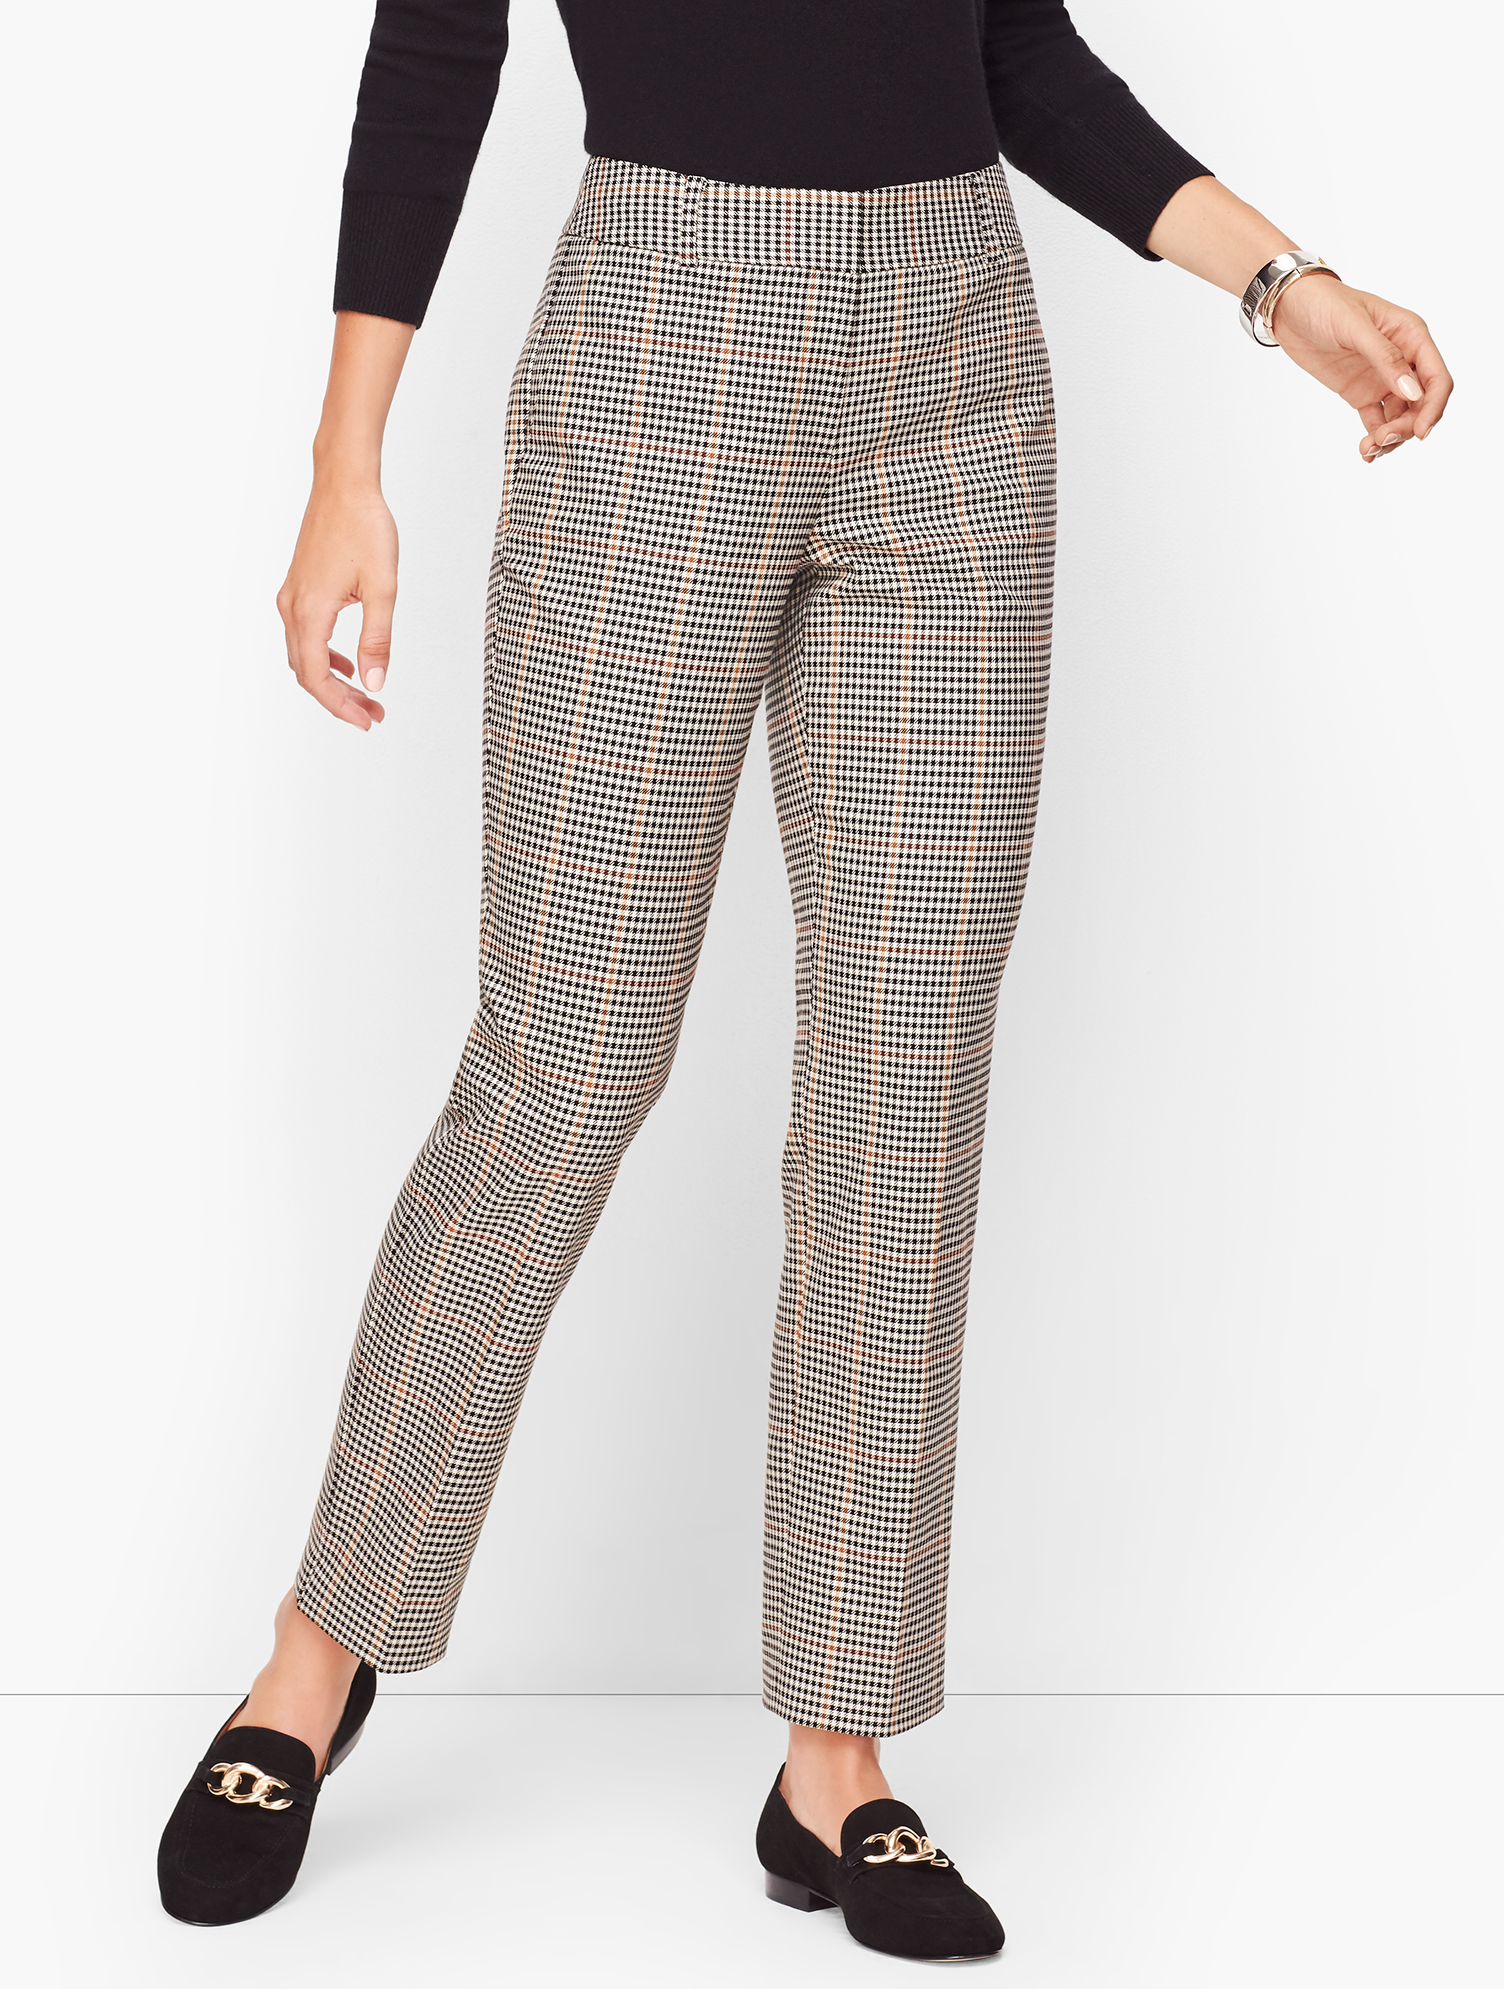 Vintage High Waisted Trousers, Sailor Pants, Jeans Talbots Hampshire Ankle Pants - Colton Check - Curvy Fit - Black Mutli - 16 $49.99 AT vintagedancer.com